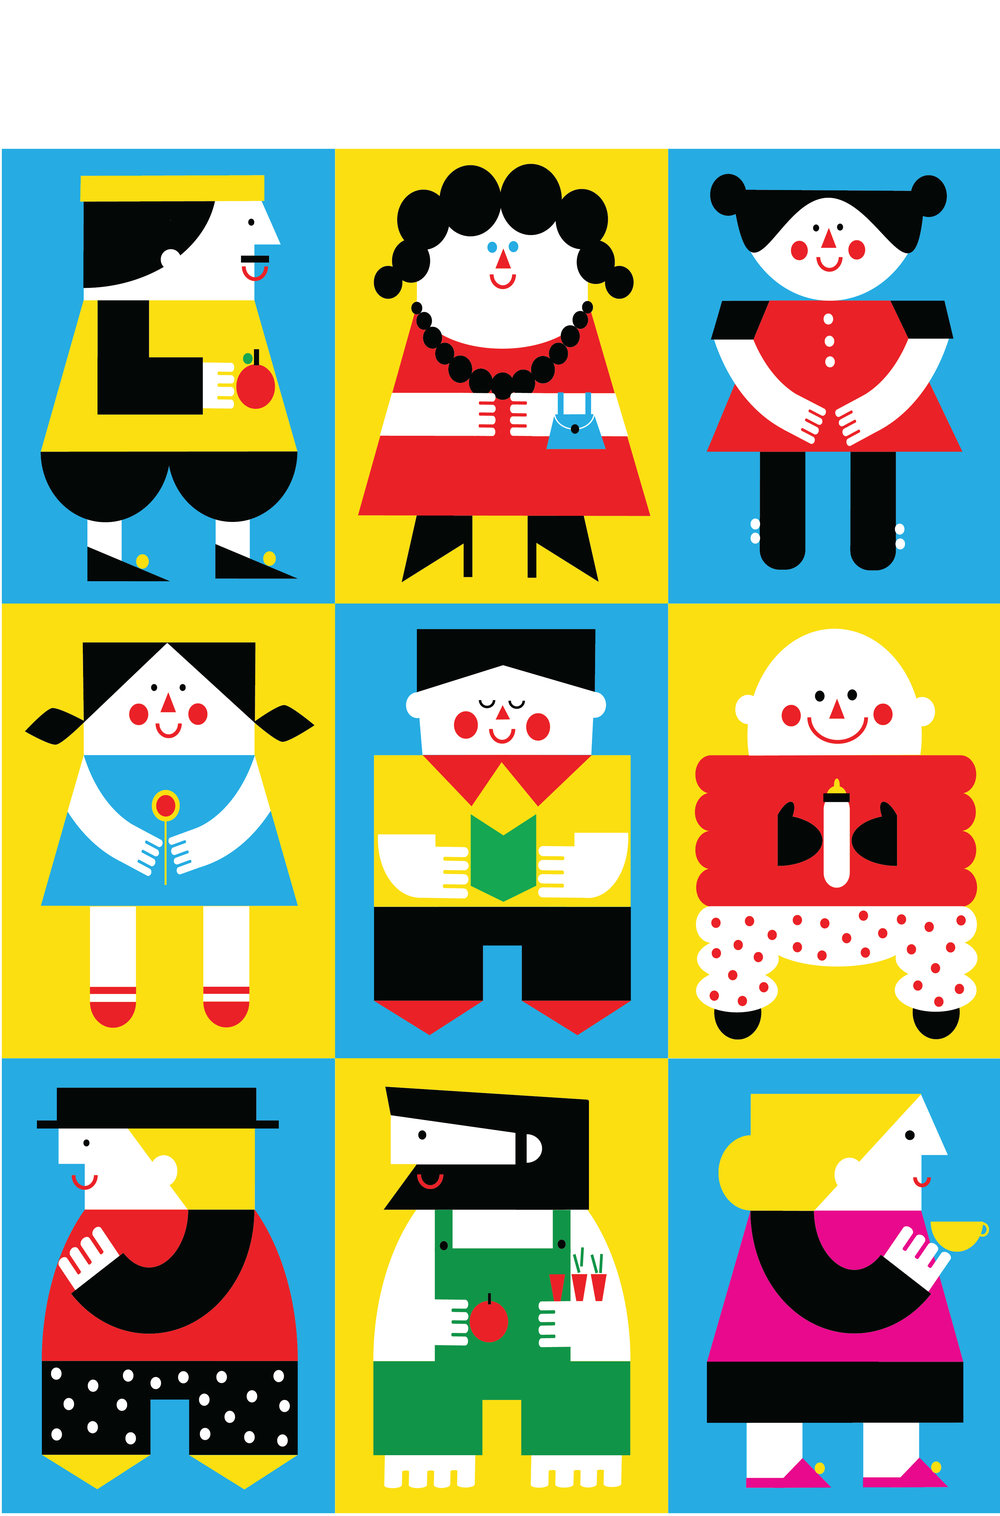 Graou magazine illustrations by Dominika Lipniewska